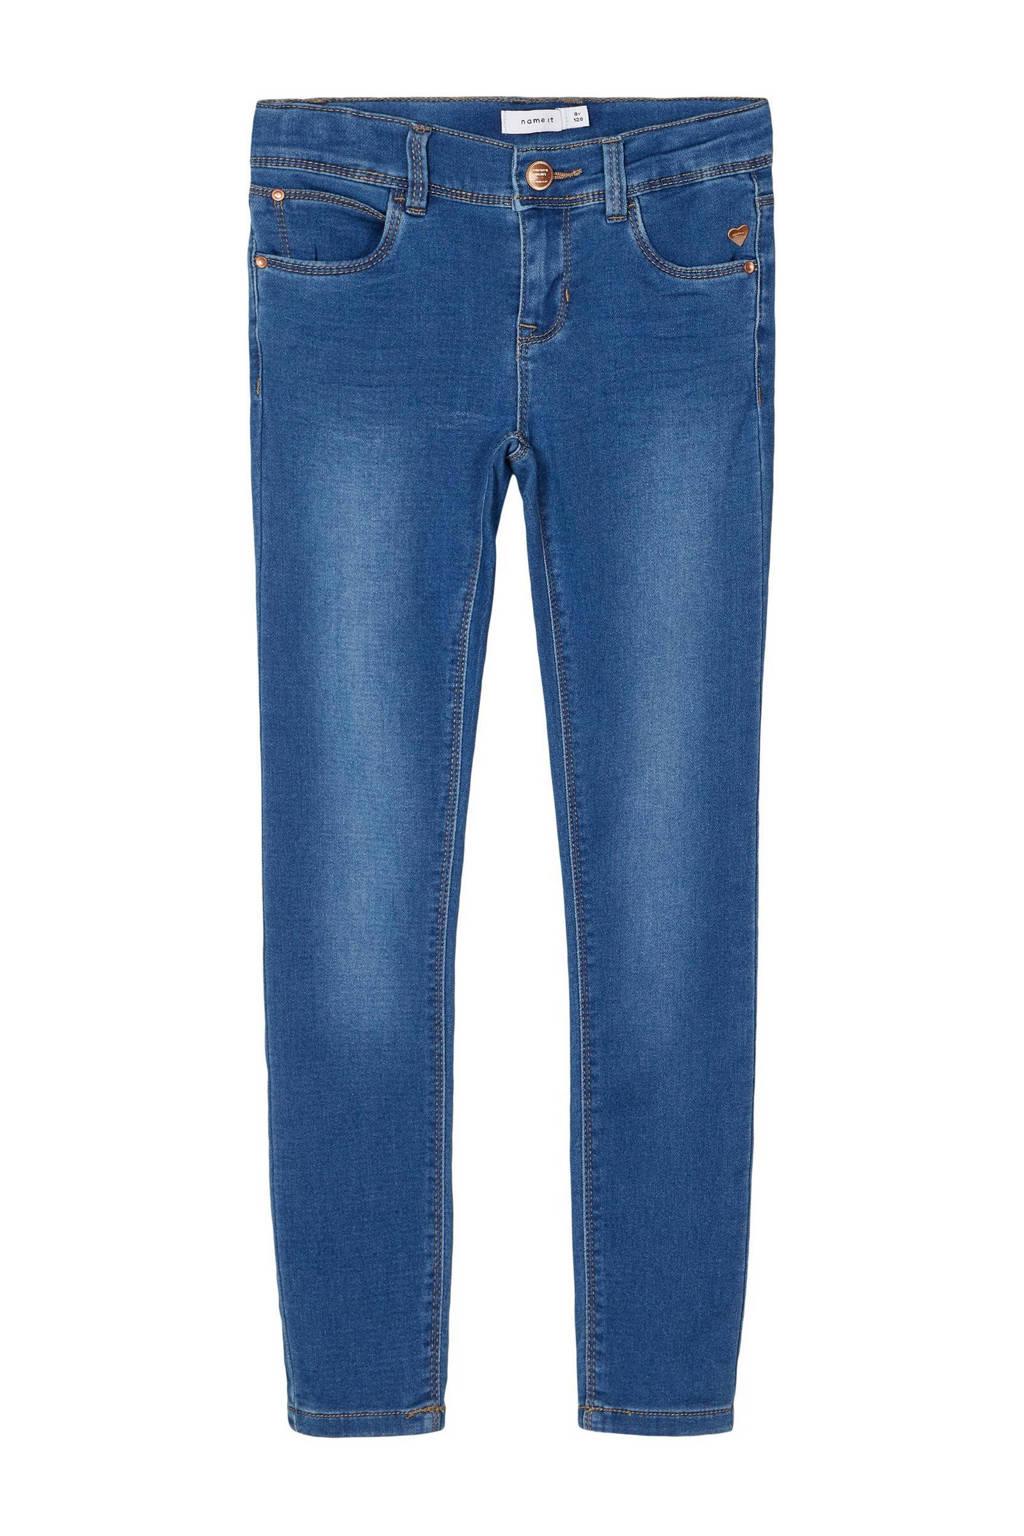 NAME IT KIDS skinny jeans NKFPOLLY middenblauw